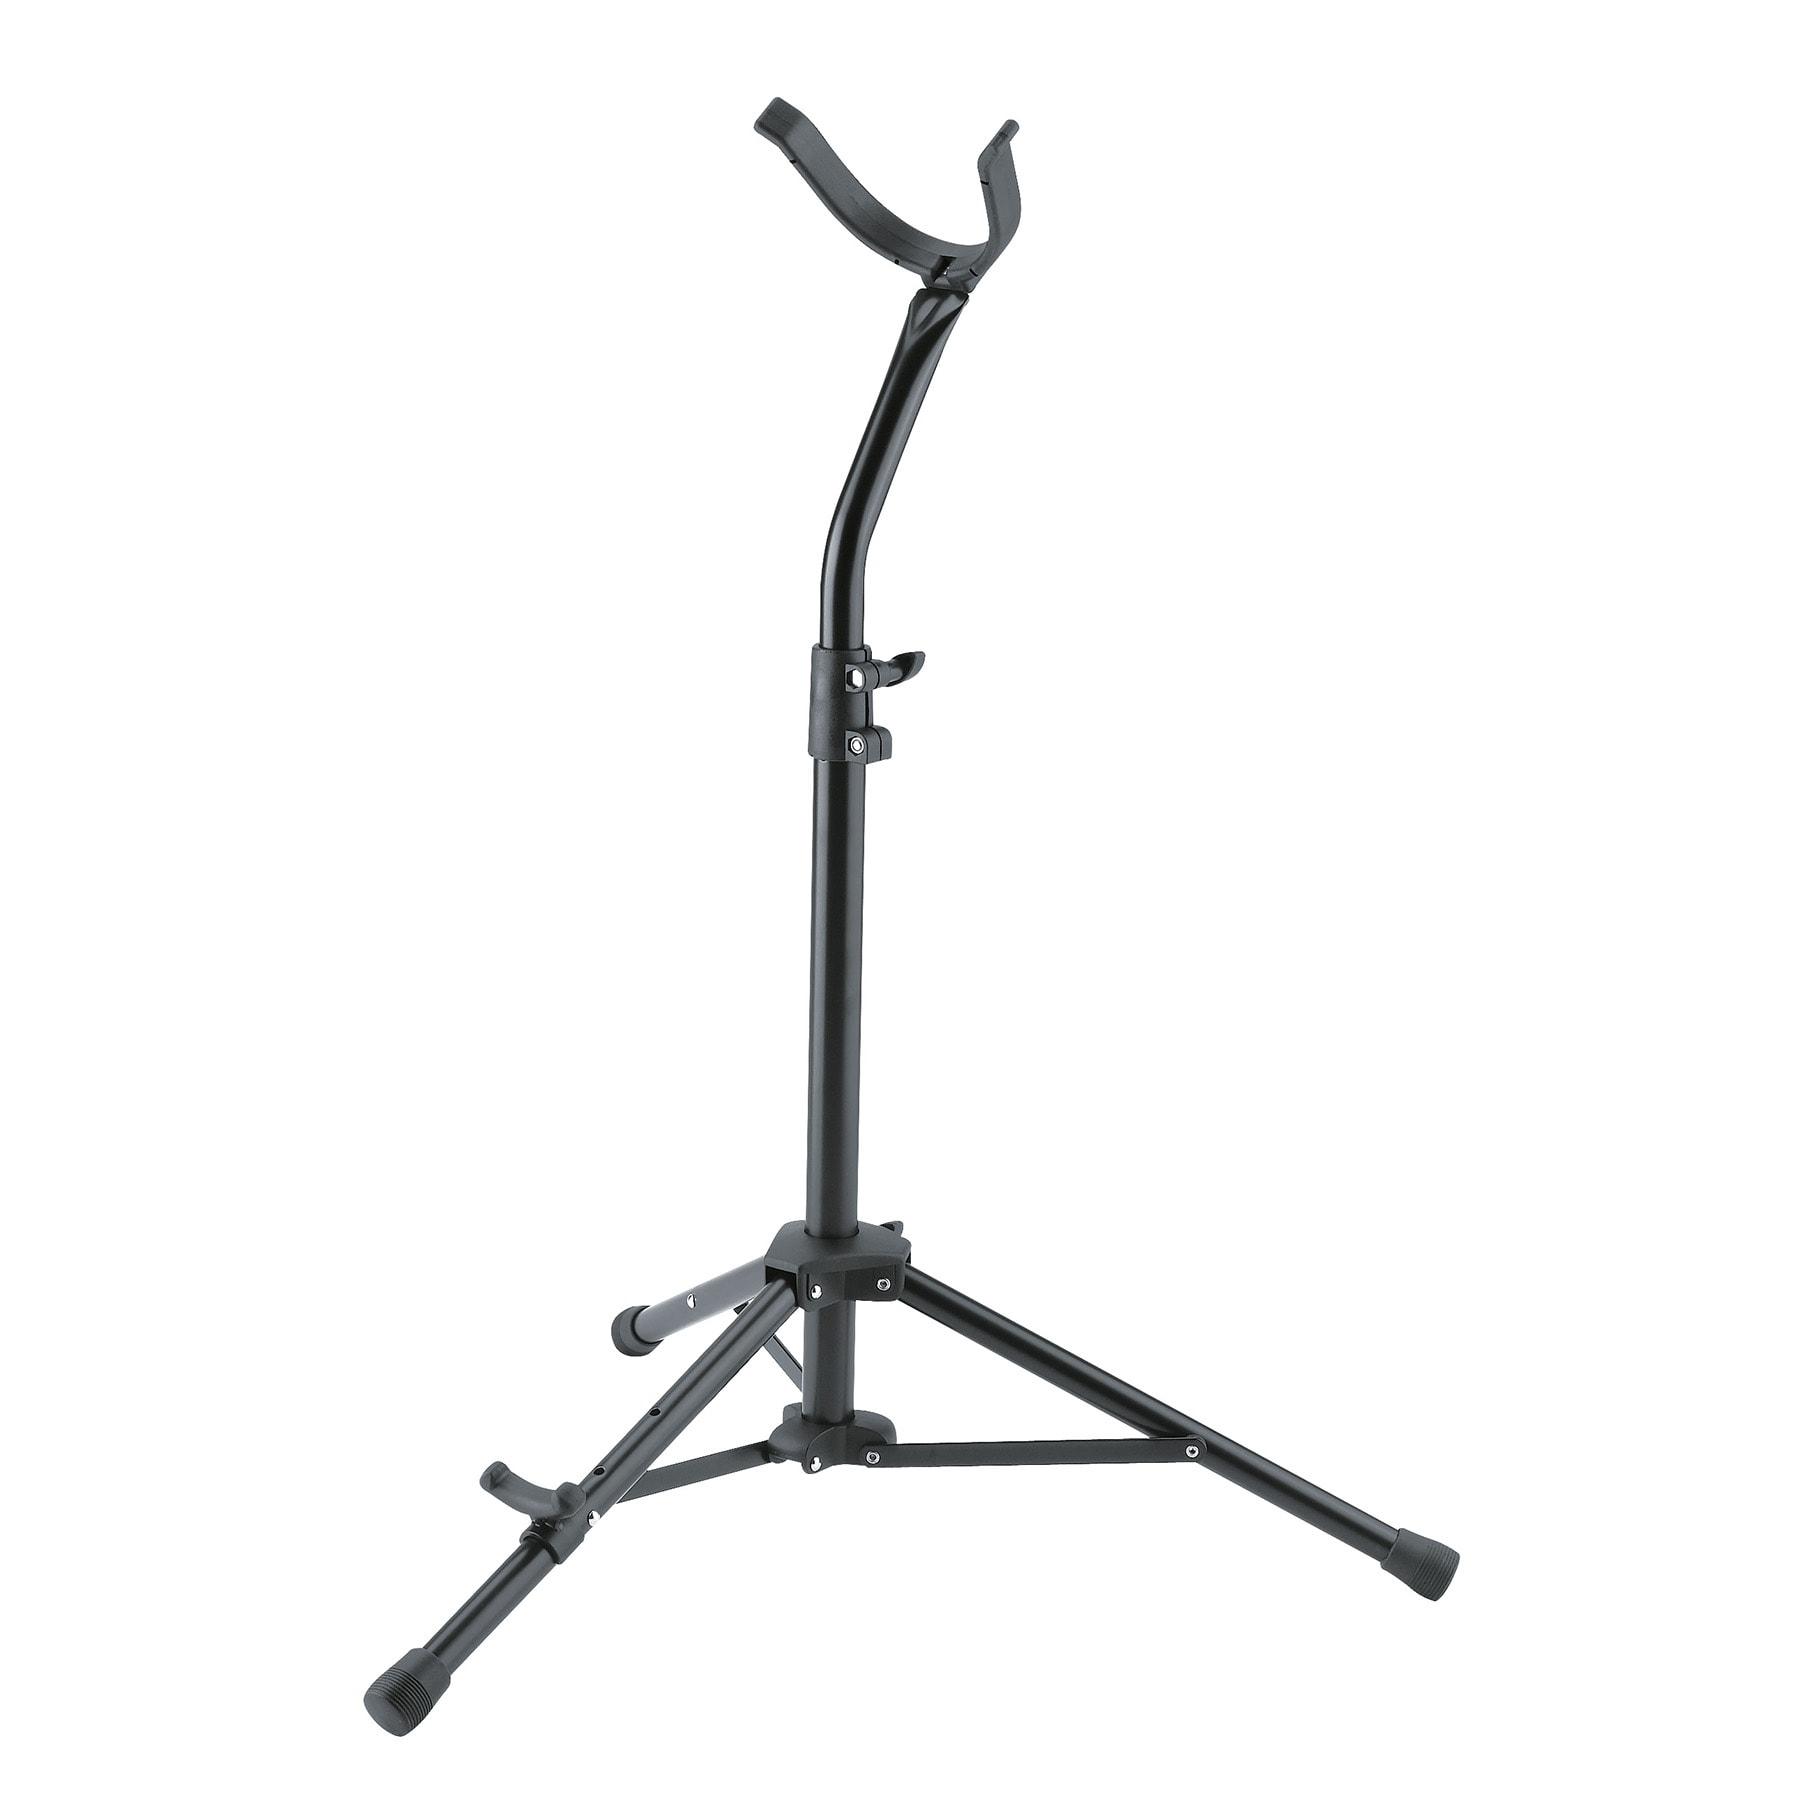 KM144_1 - Baritone saxophone stand